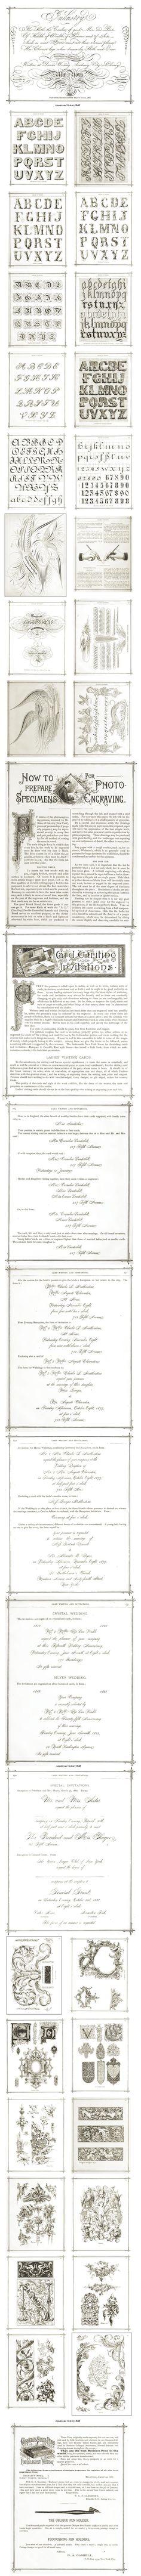 illuminated Handwritten sheets of music | Victorian Era Handwriting Calligraphy Penmanship Alphabet Lettering ...